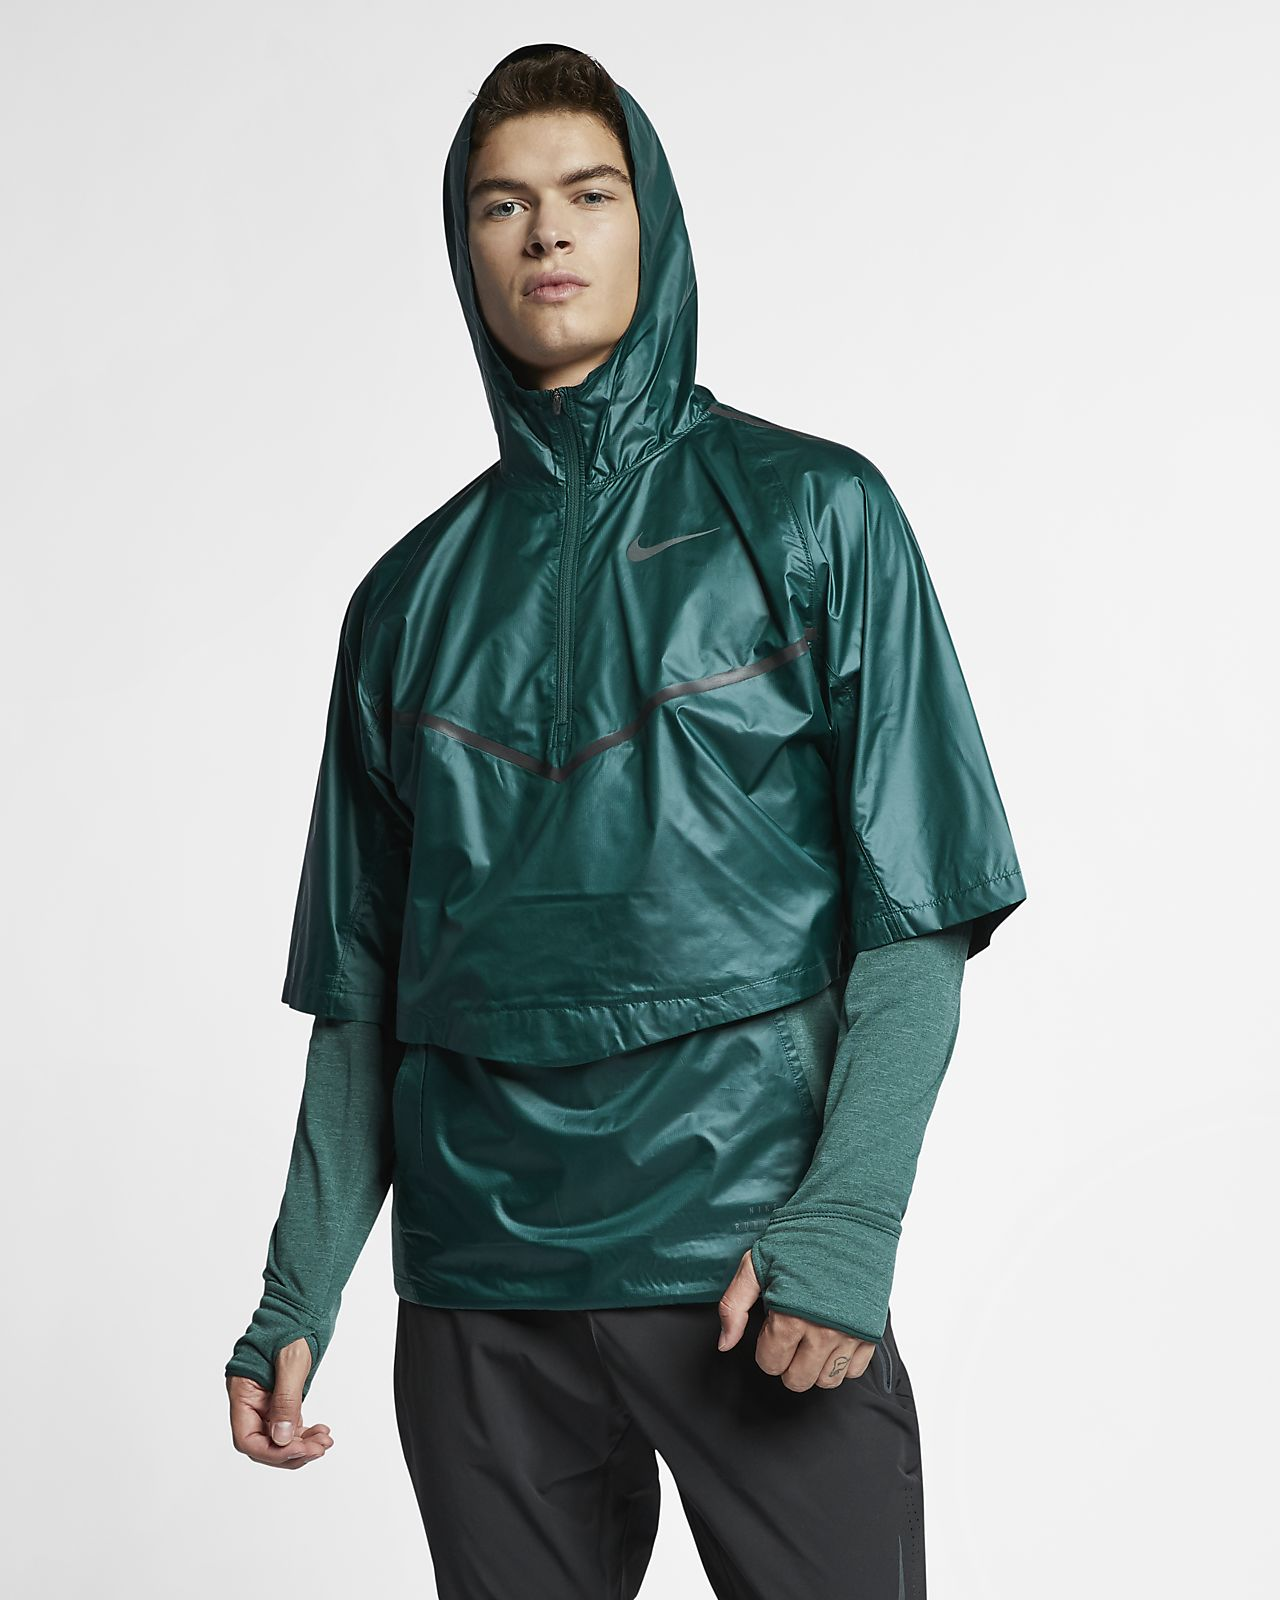 Nike Sphere Transform Hardlooptop voor heren